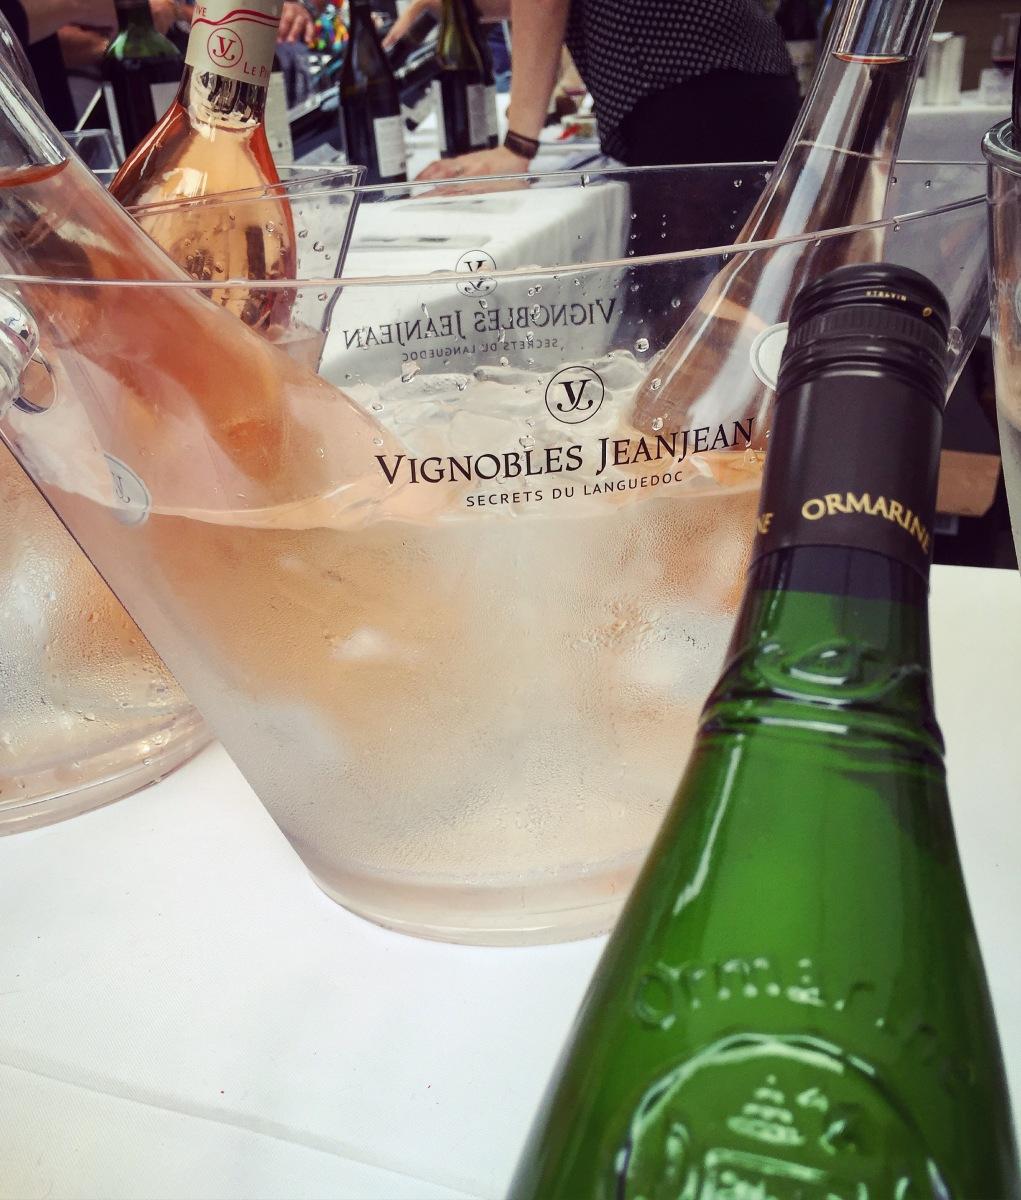 FVS2016 - Vignoble Jean #2